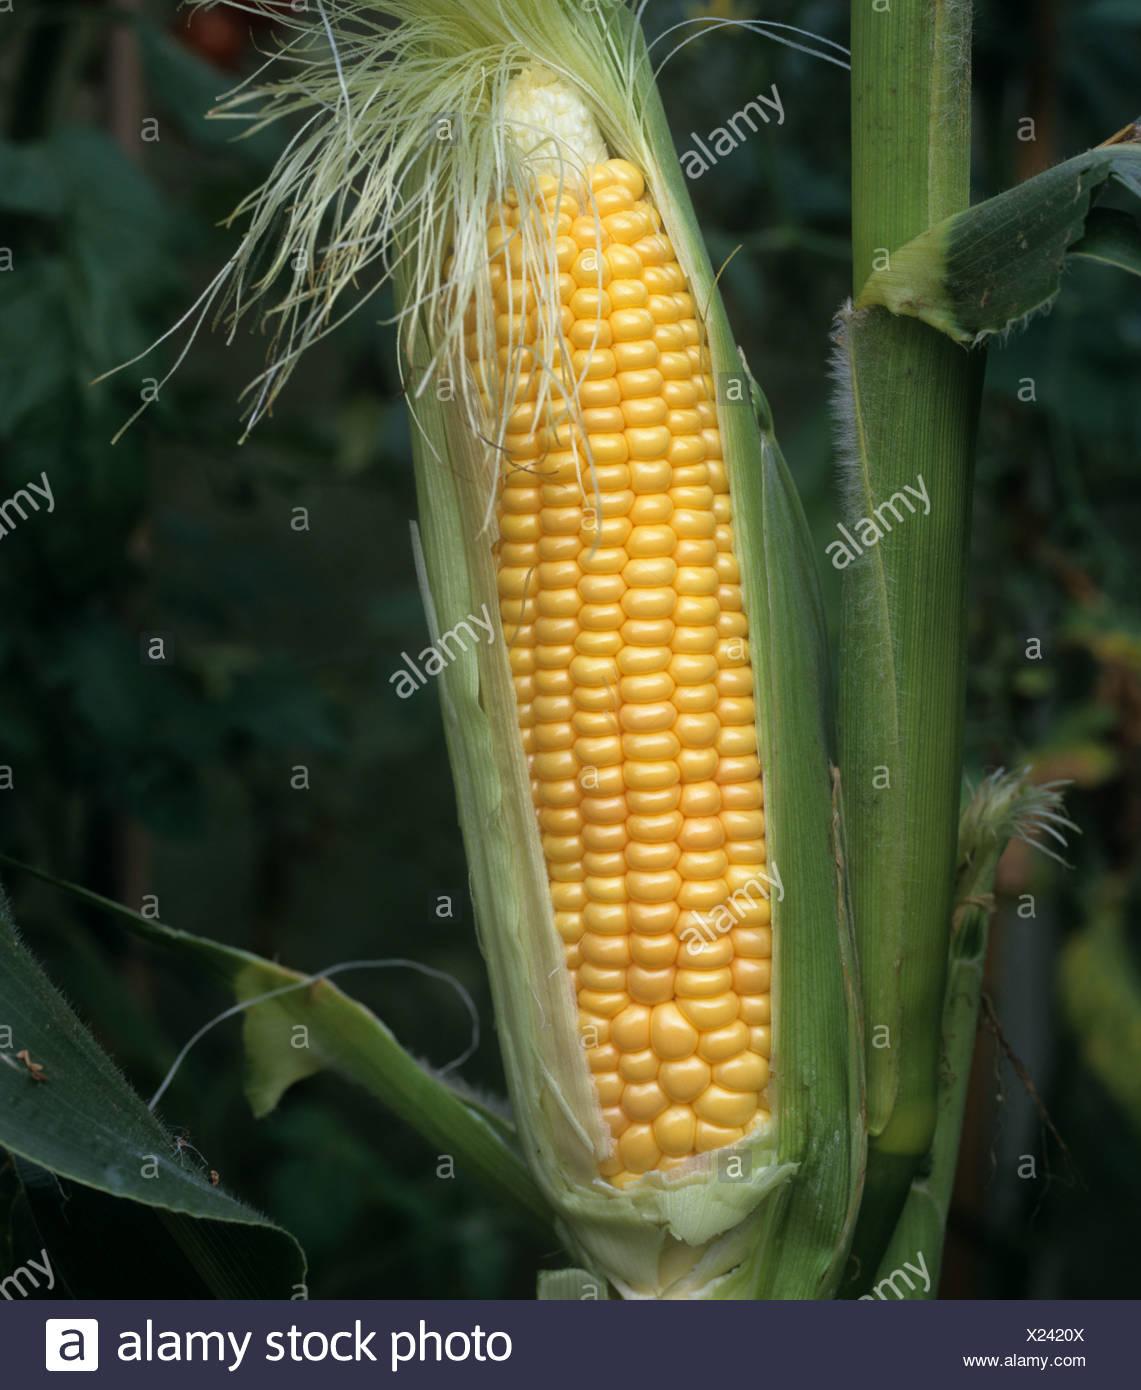 Mazorca de maíz dulce madura expuesta Imagen De Stock